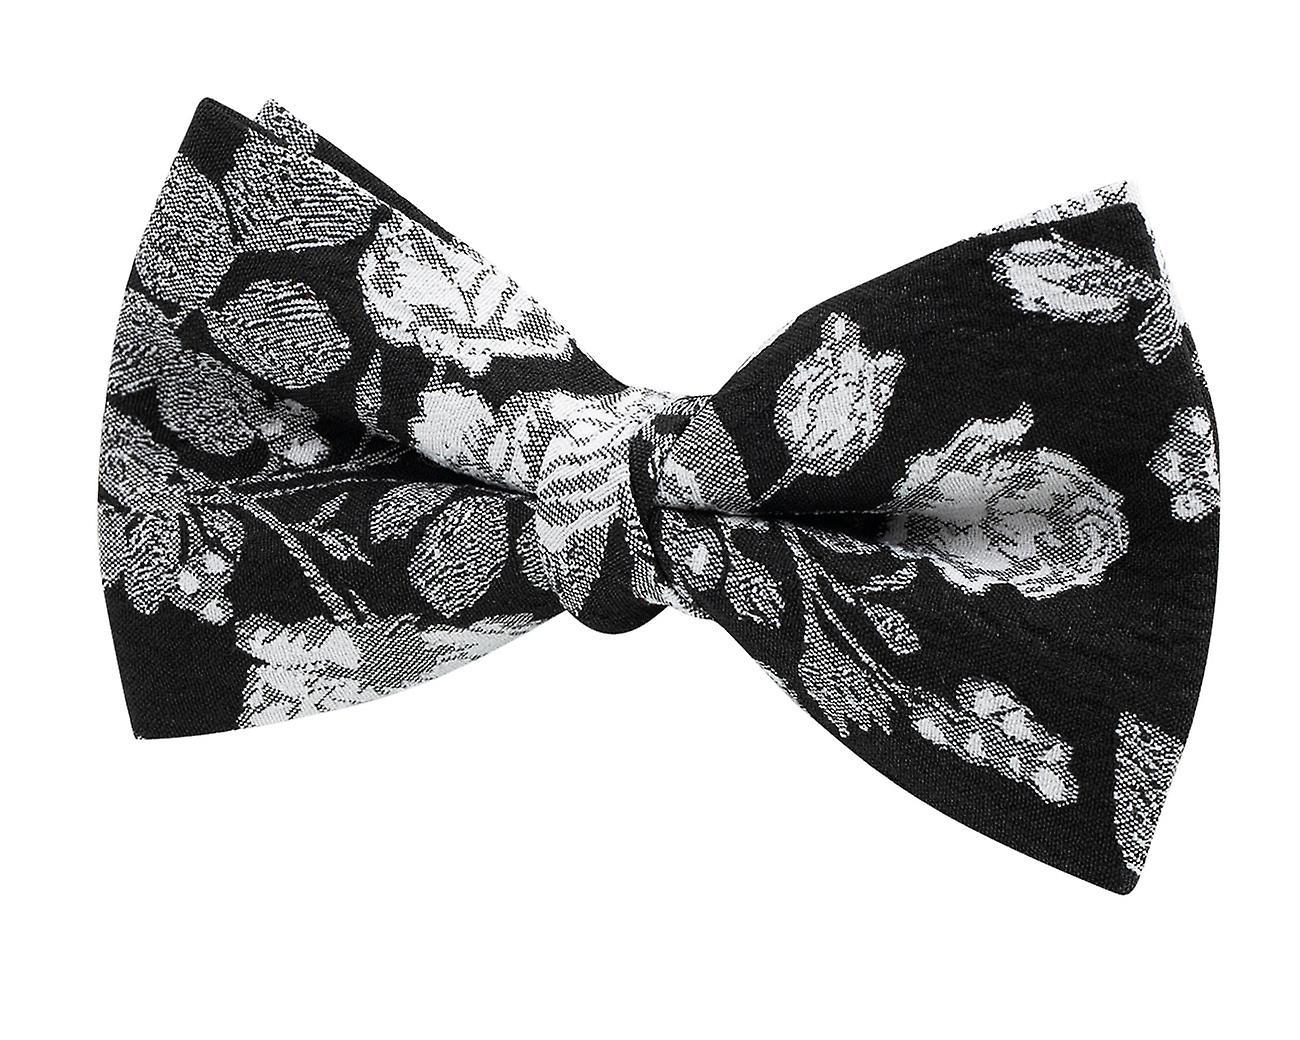 Dobell mens Black Bow tie met witte bloemen Jacquard vooraf gebonden